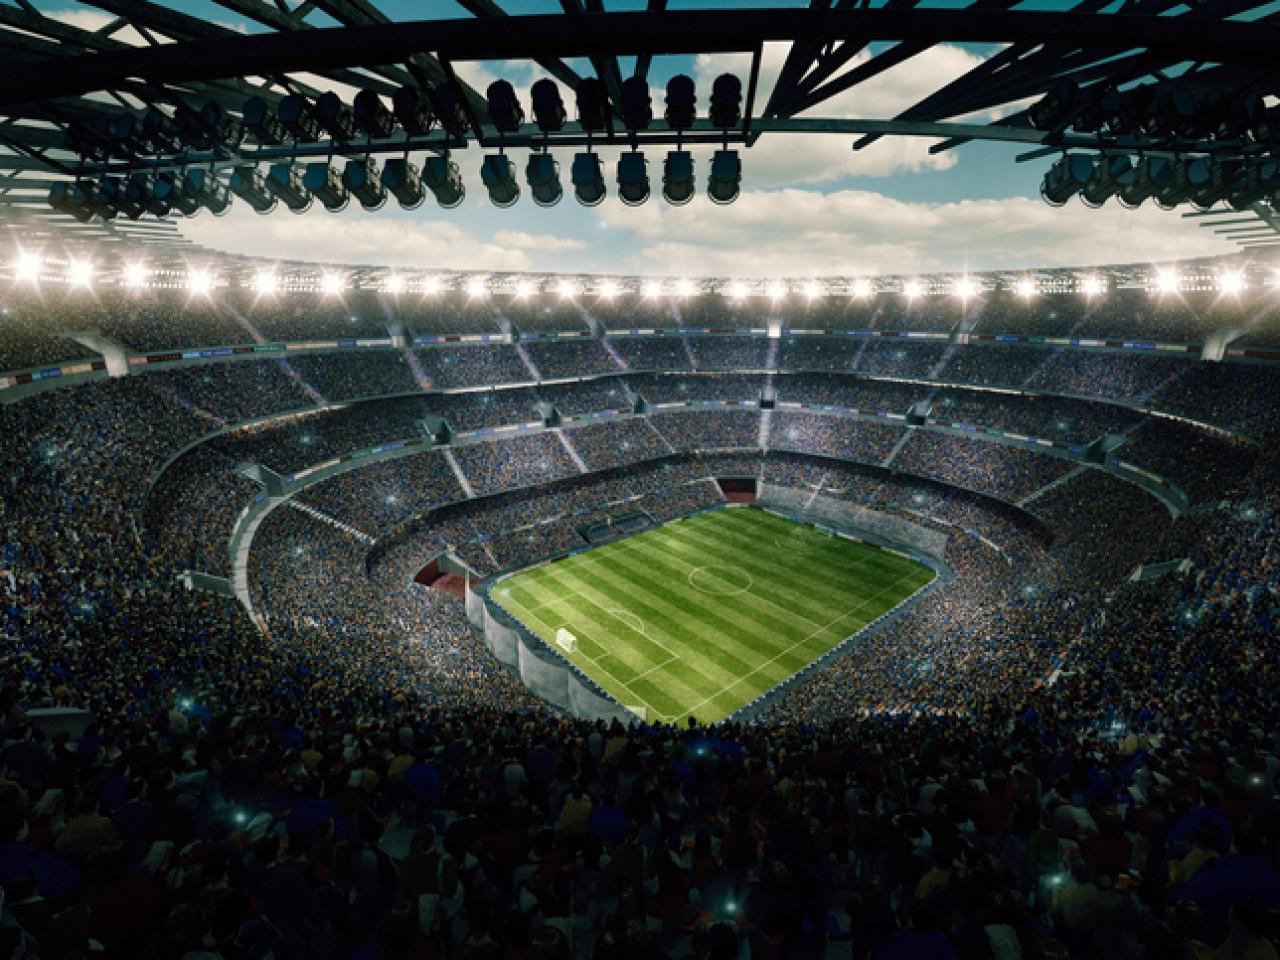 Olympique Lyonnais Hotel & Match Ticket Breaks